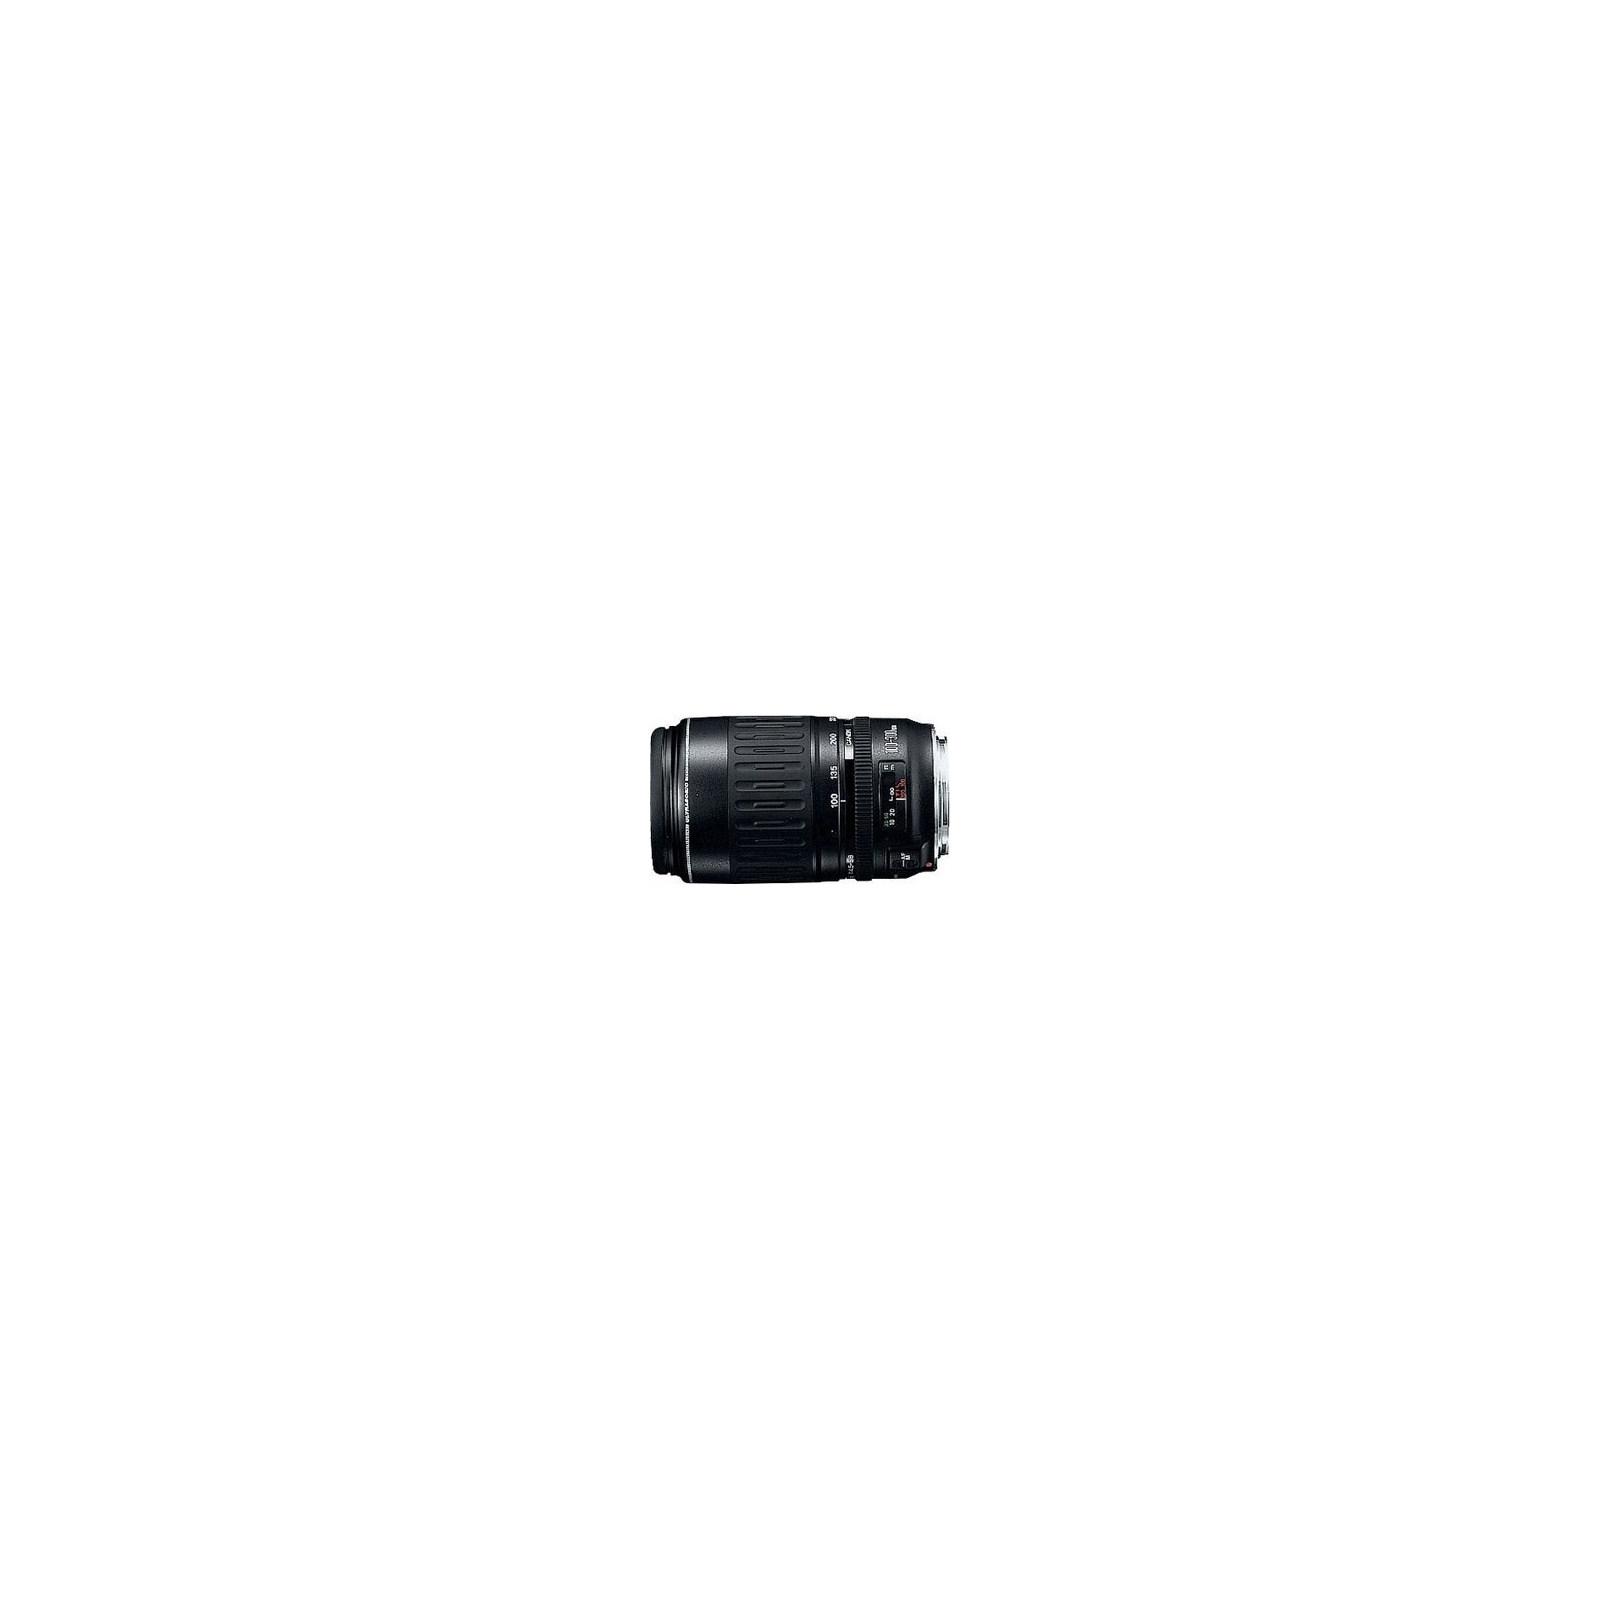 Объектив EF 100-300mm f/4.5-5.6 USM Canon (2565A019)